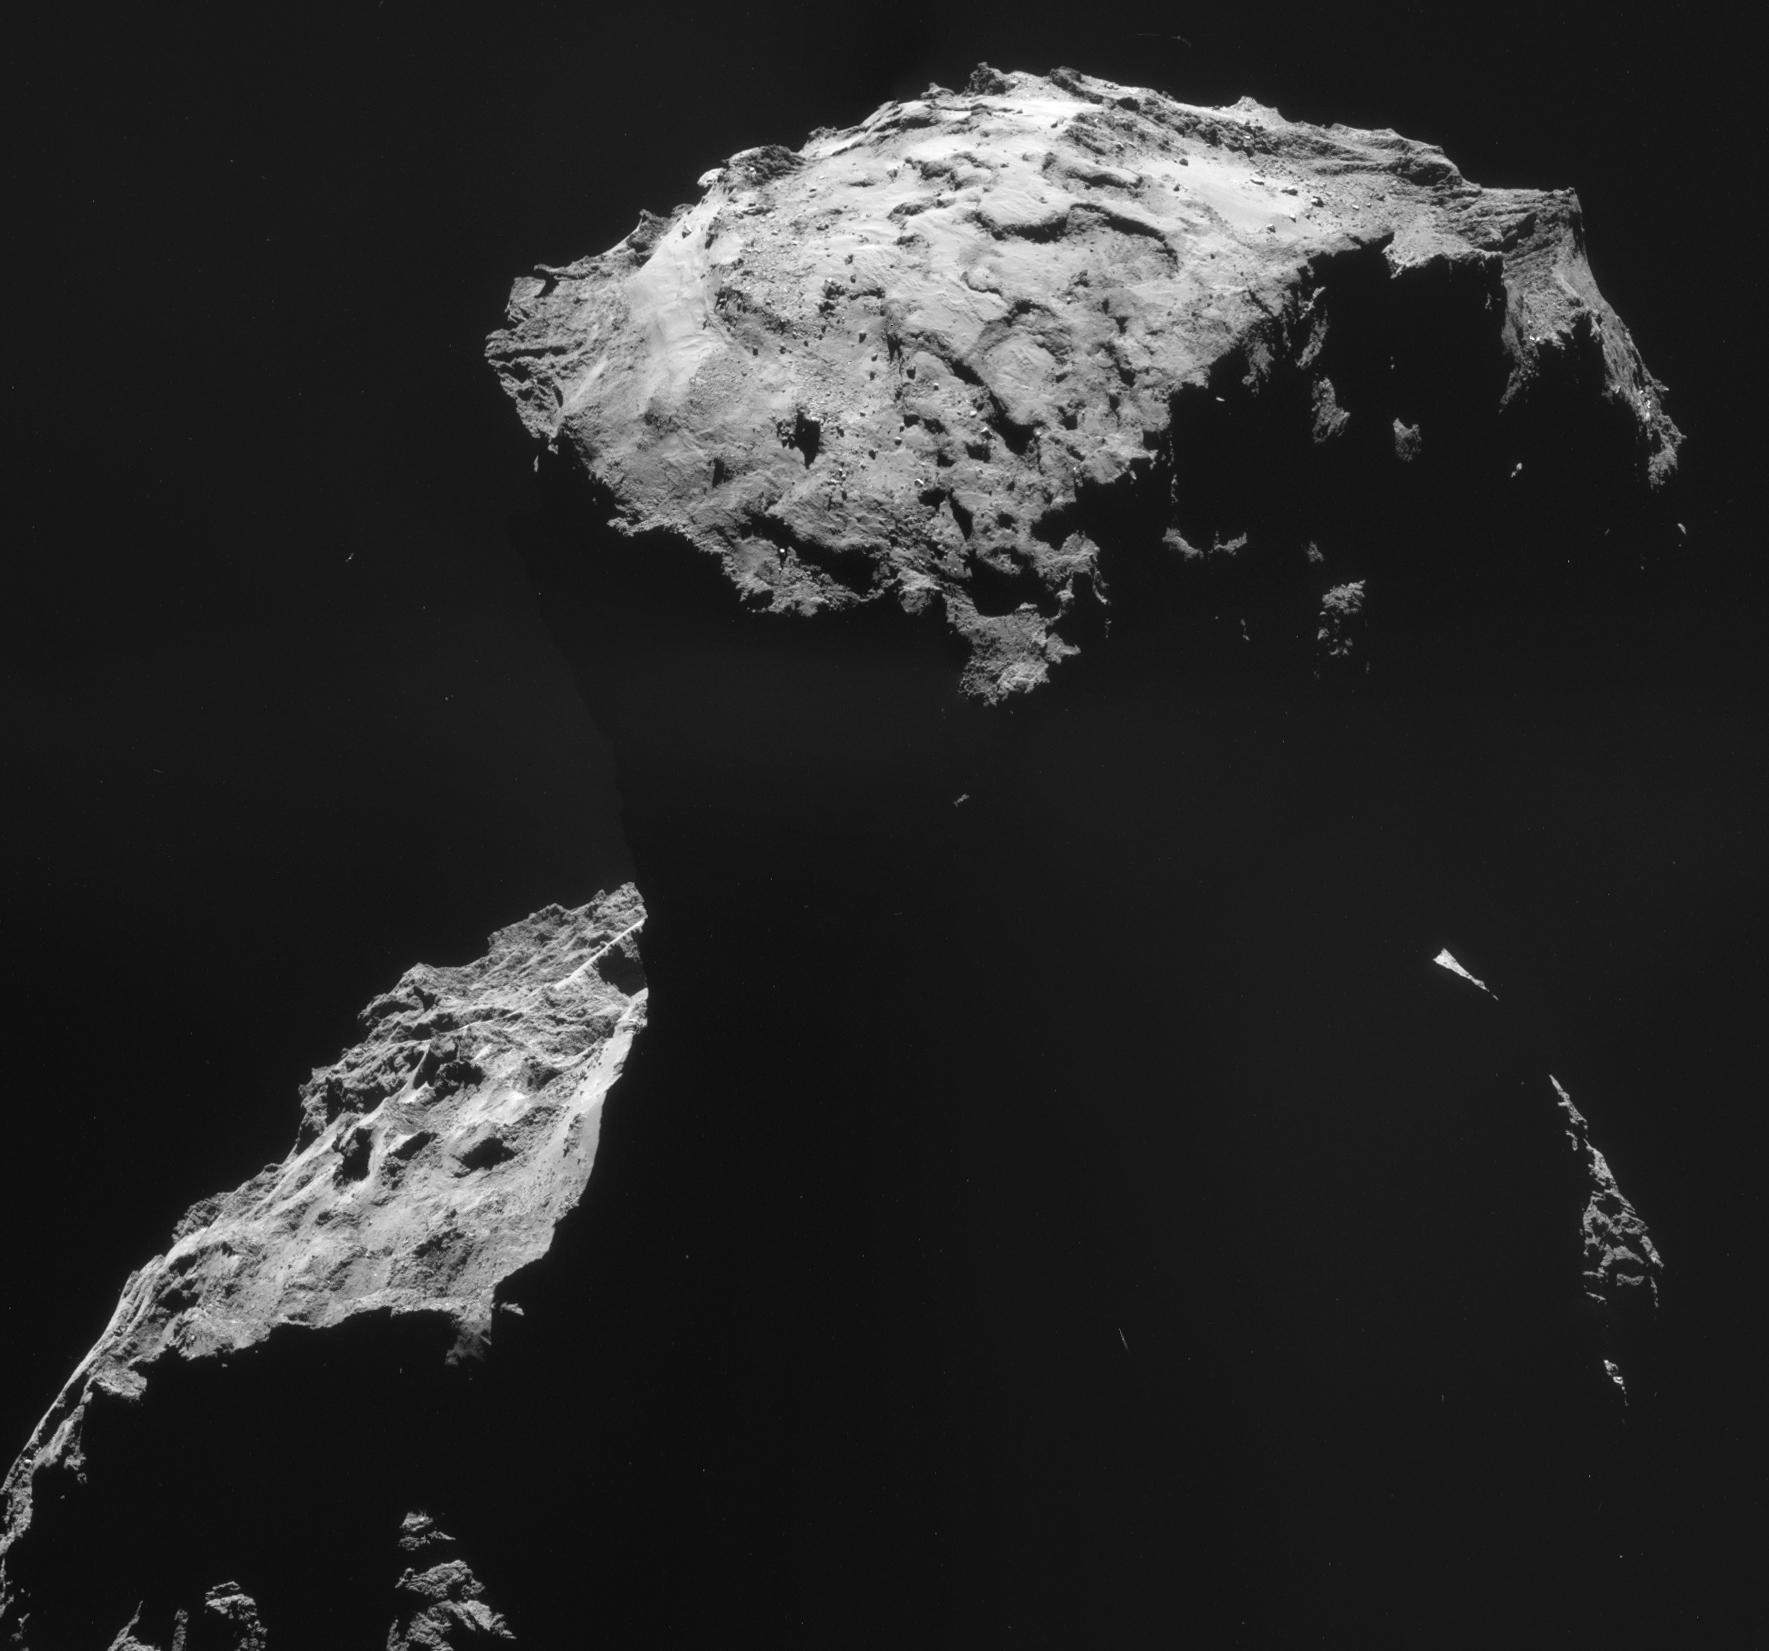 nasa comet lander name - photo #24